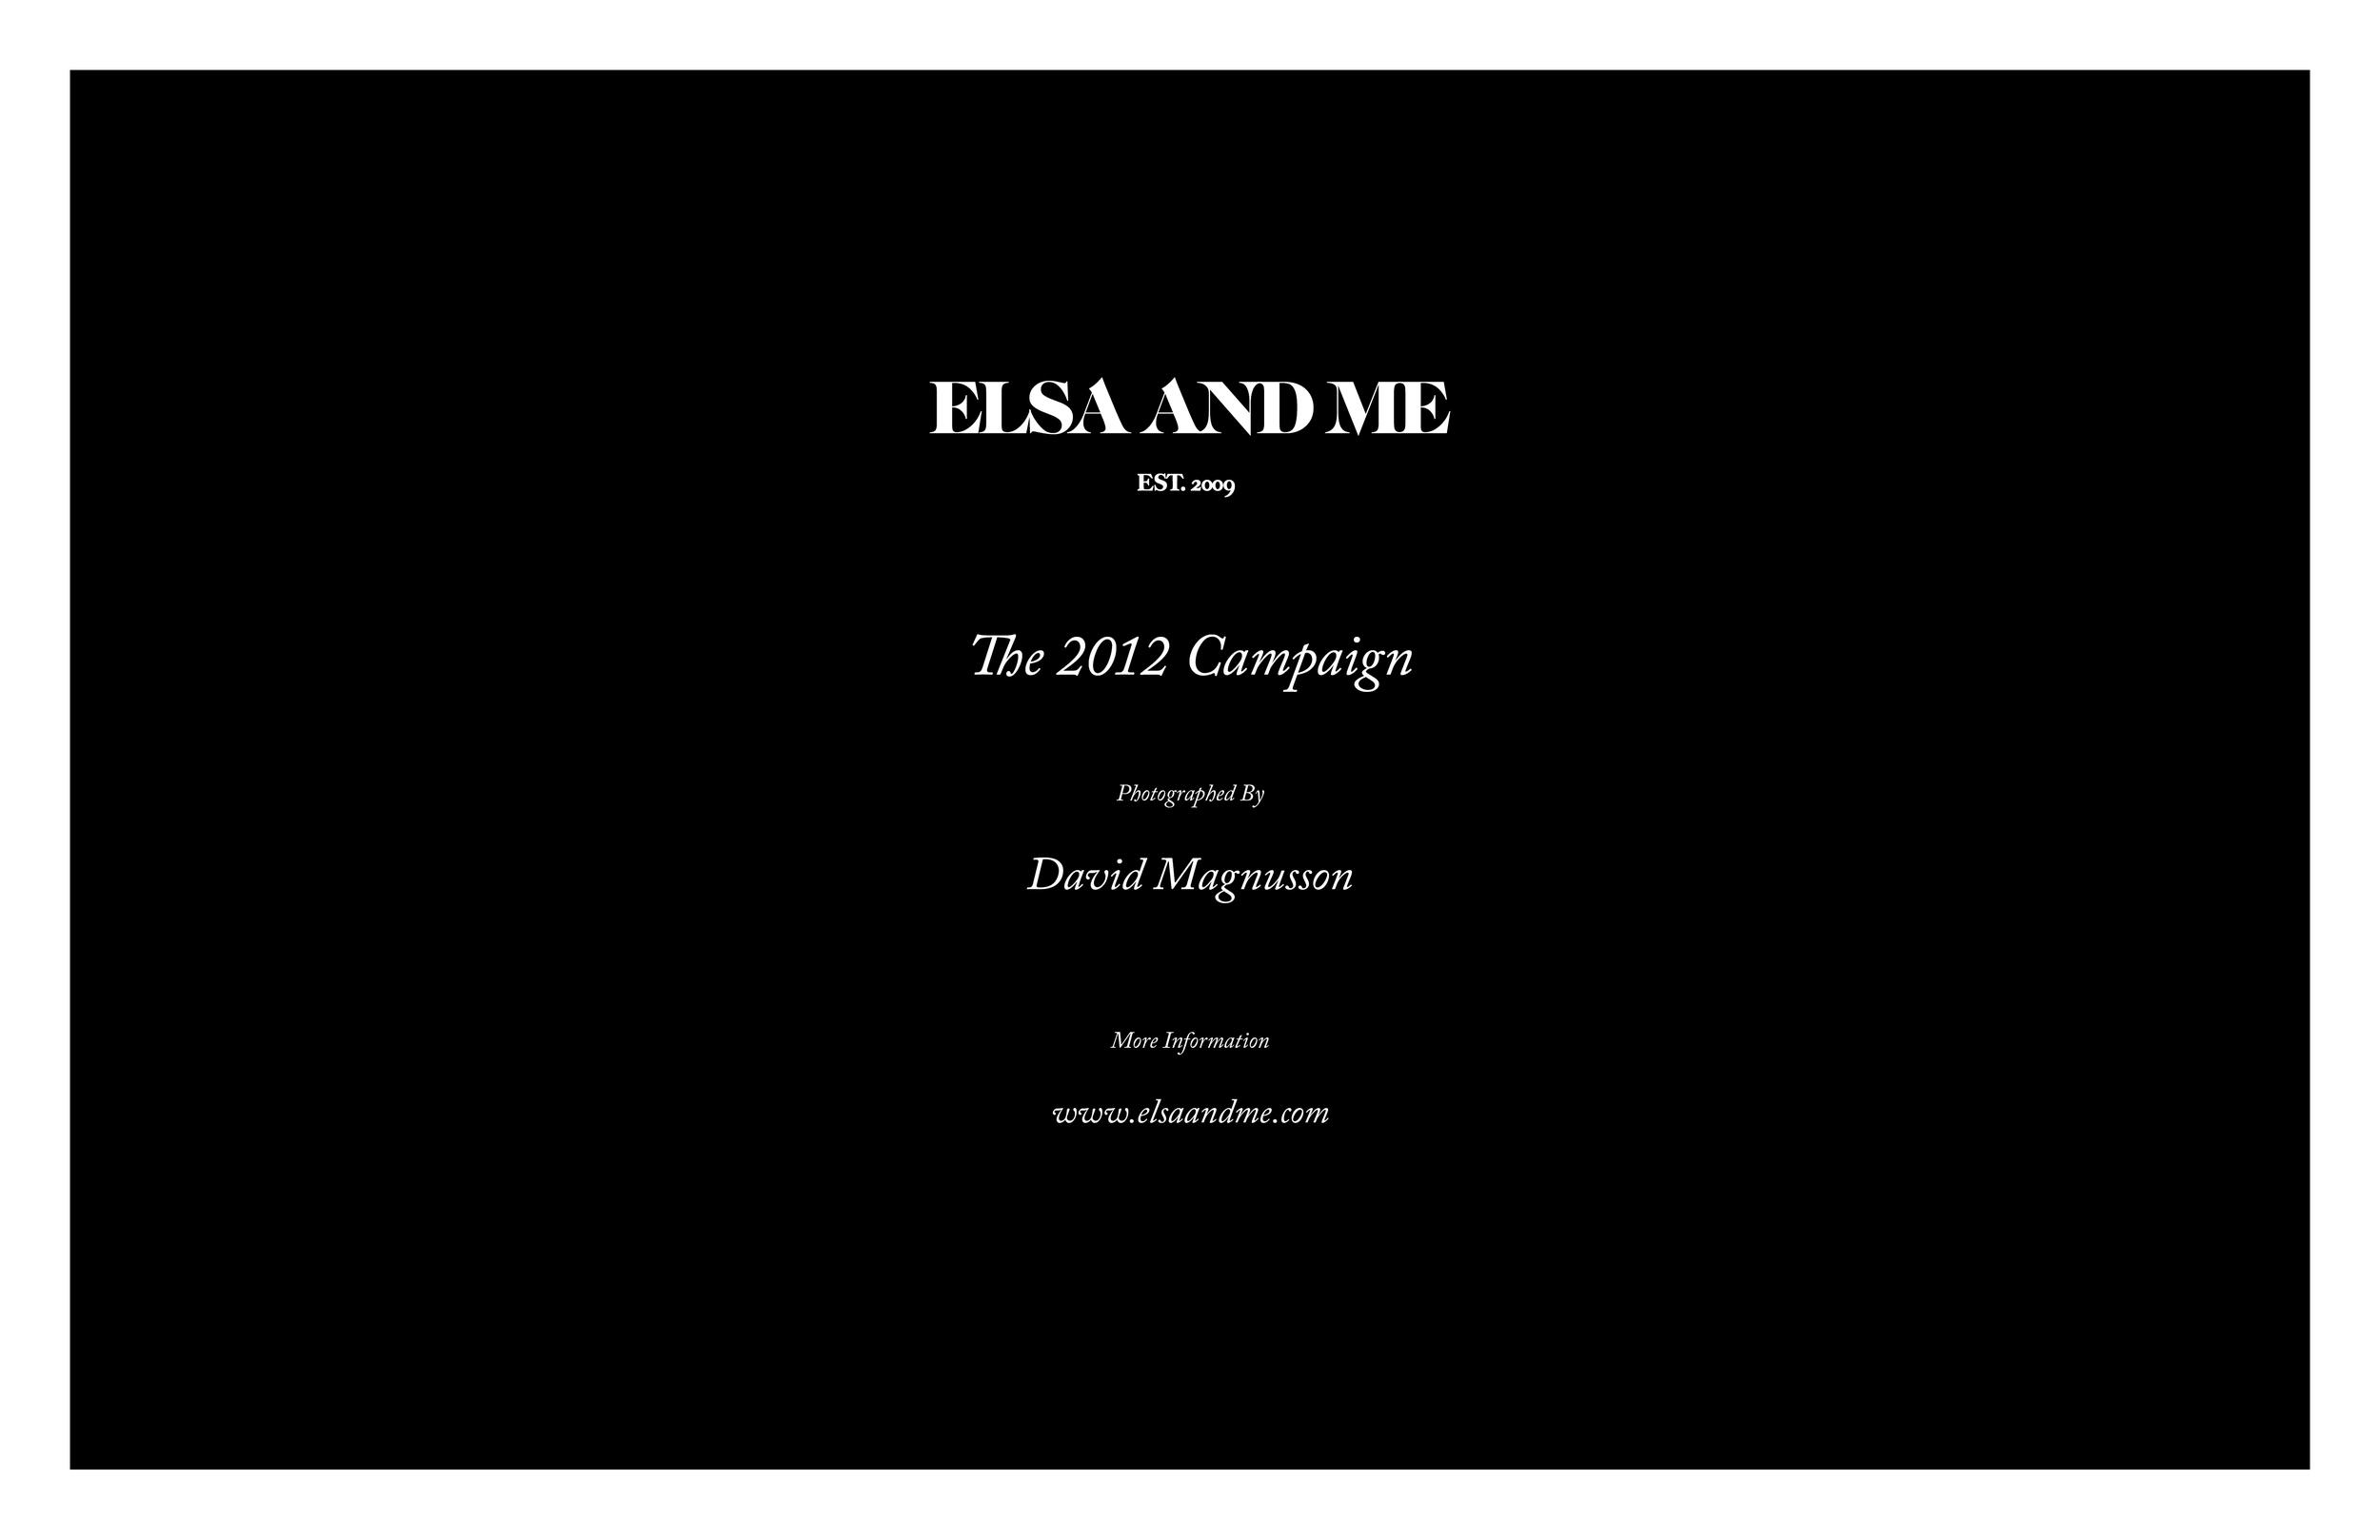 Elsa-And-Me-2010-Campaign8.jpg